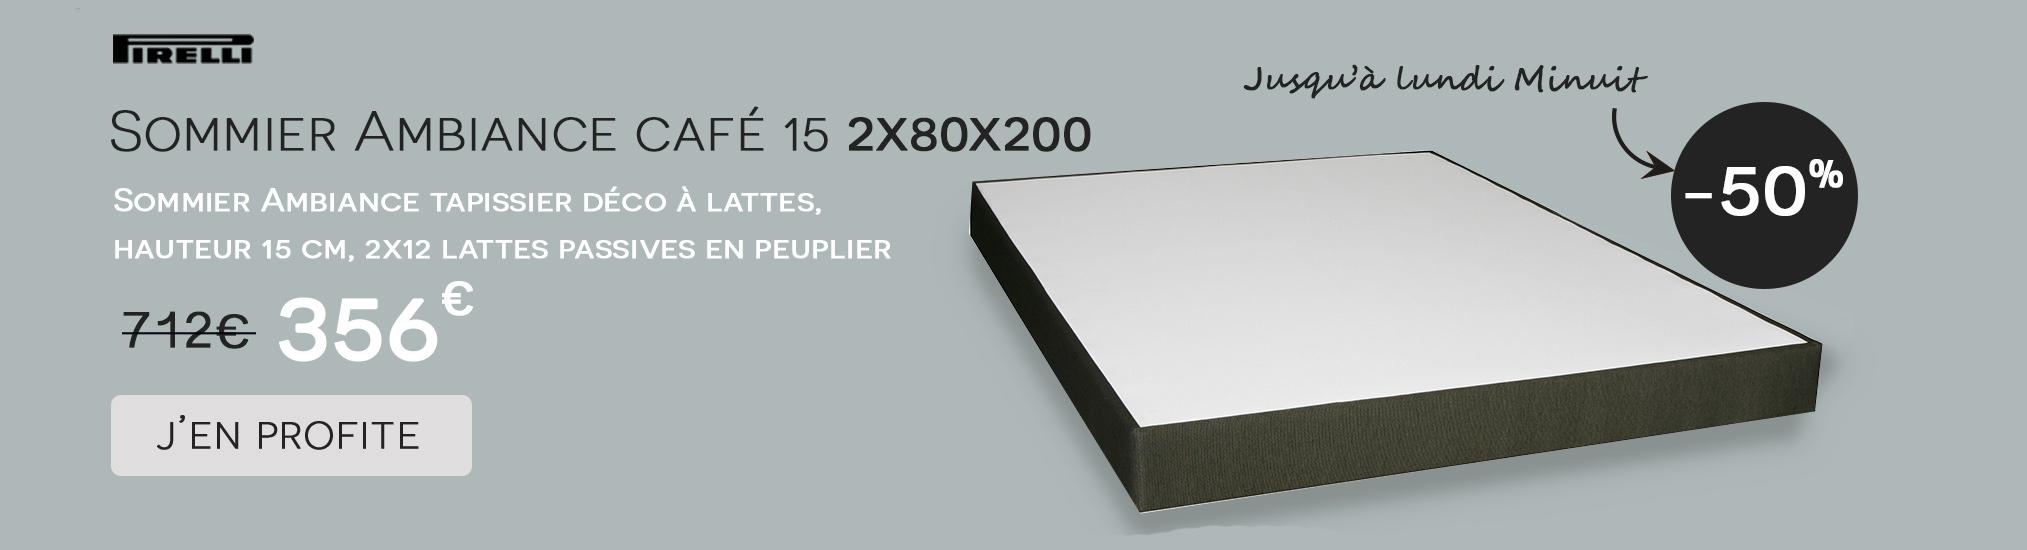 Sommier ambiance 15 Pirelli 2x80x200